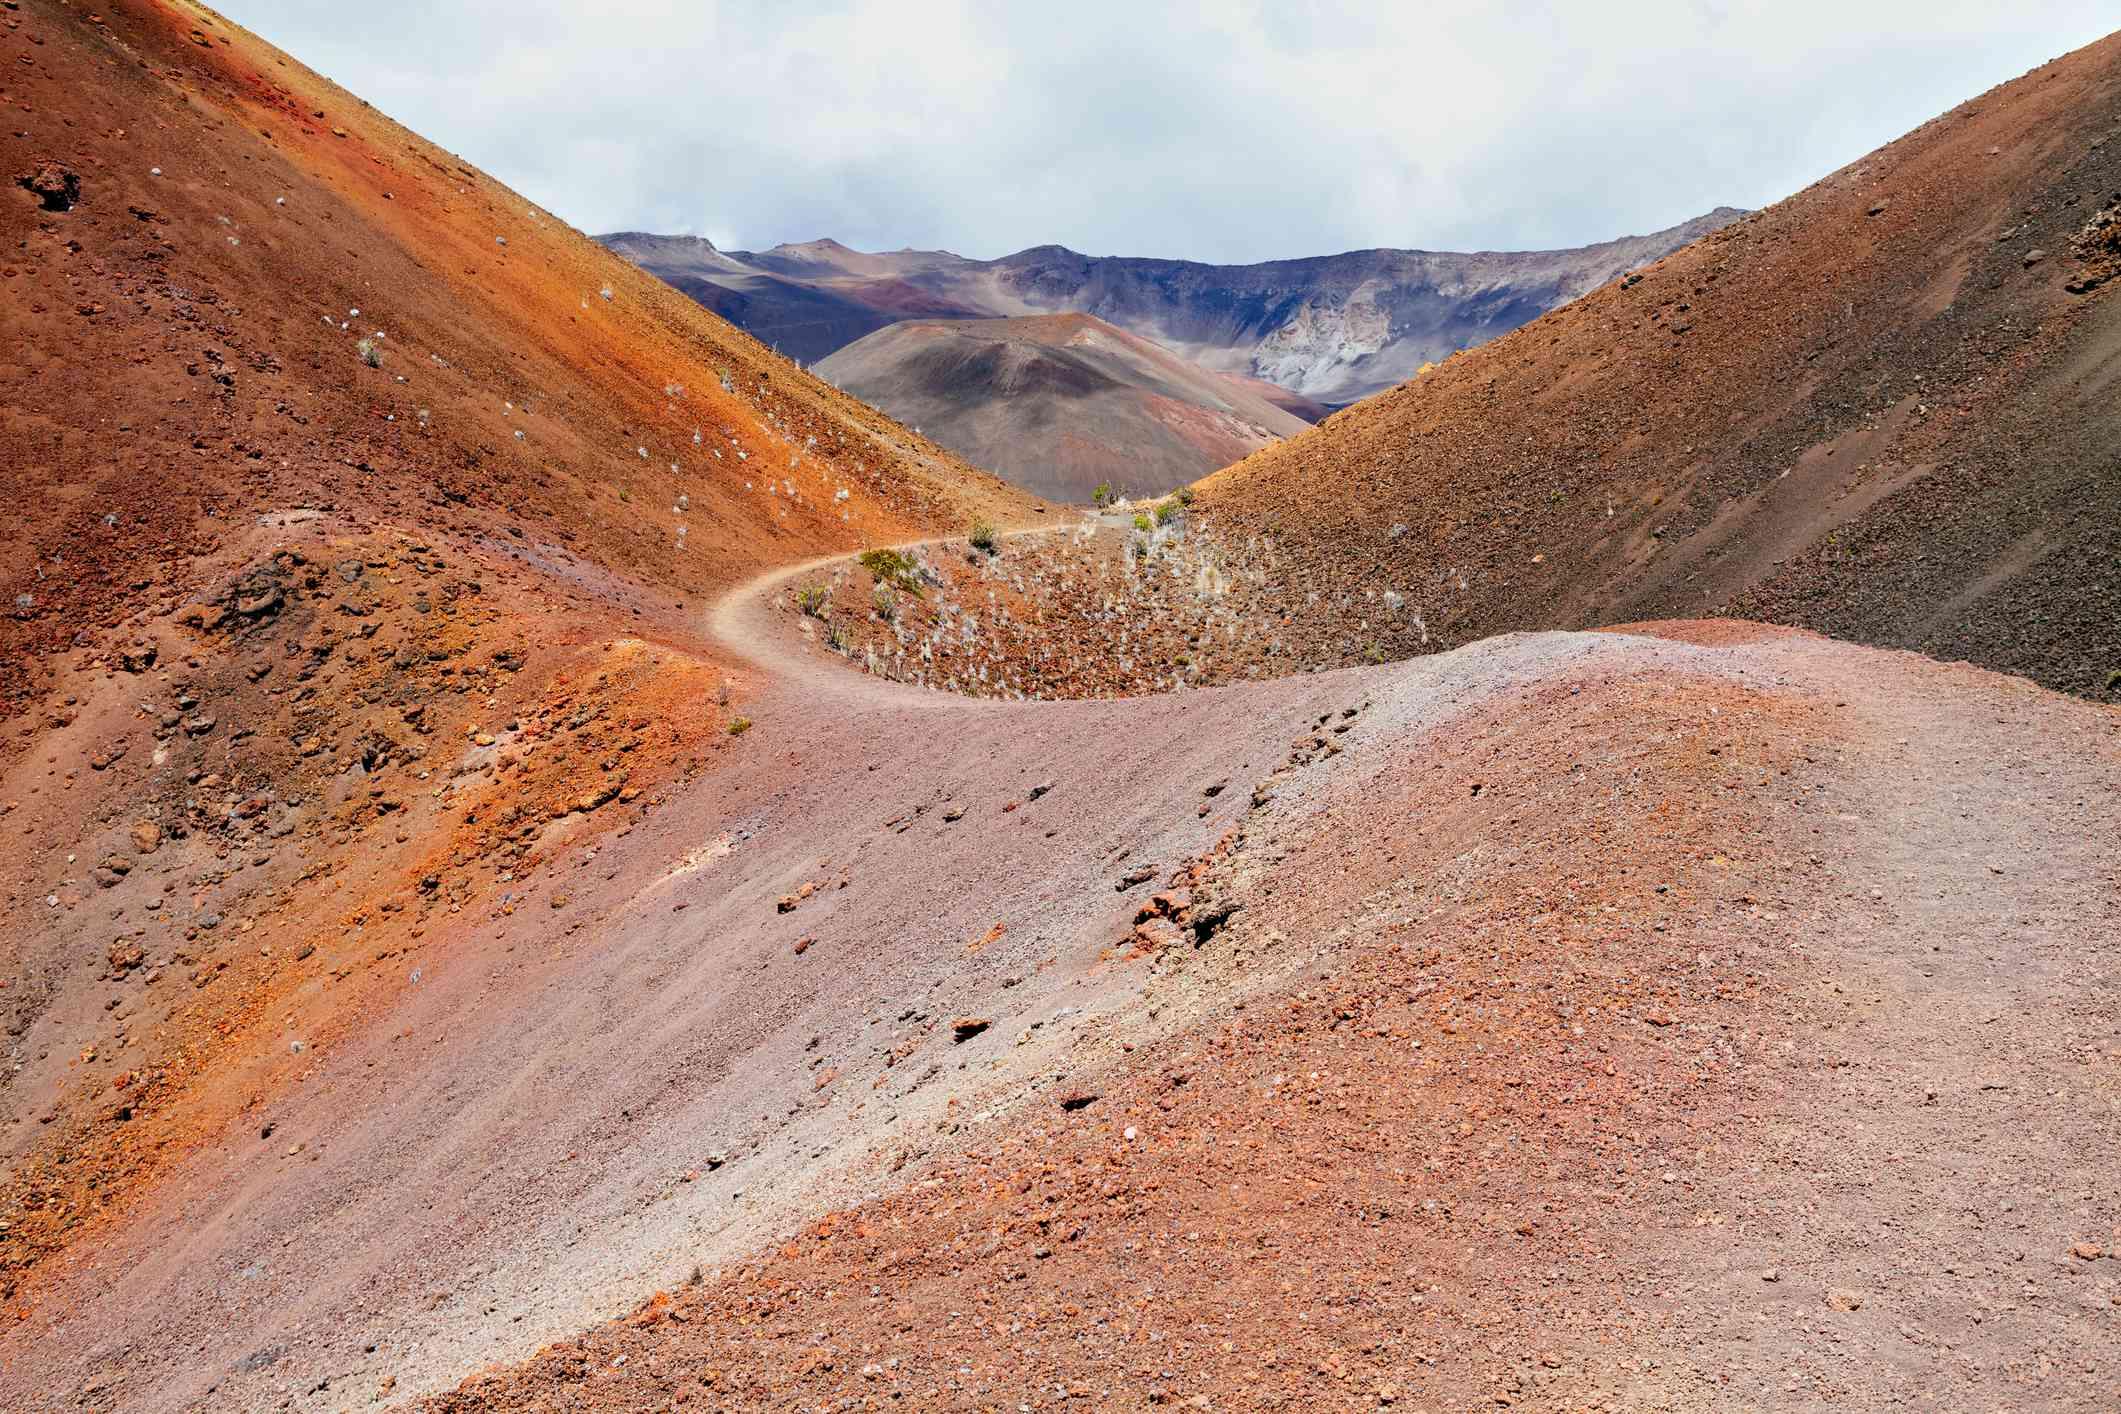 Pele's Paint Pot inside Haleakala National Park